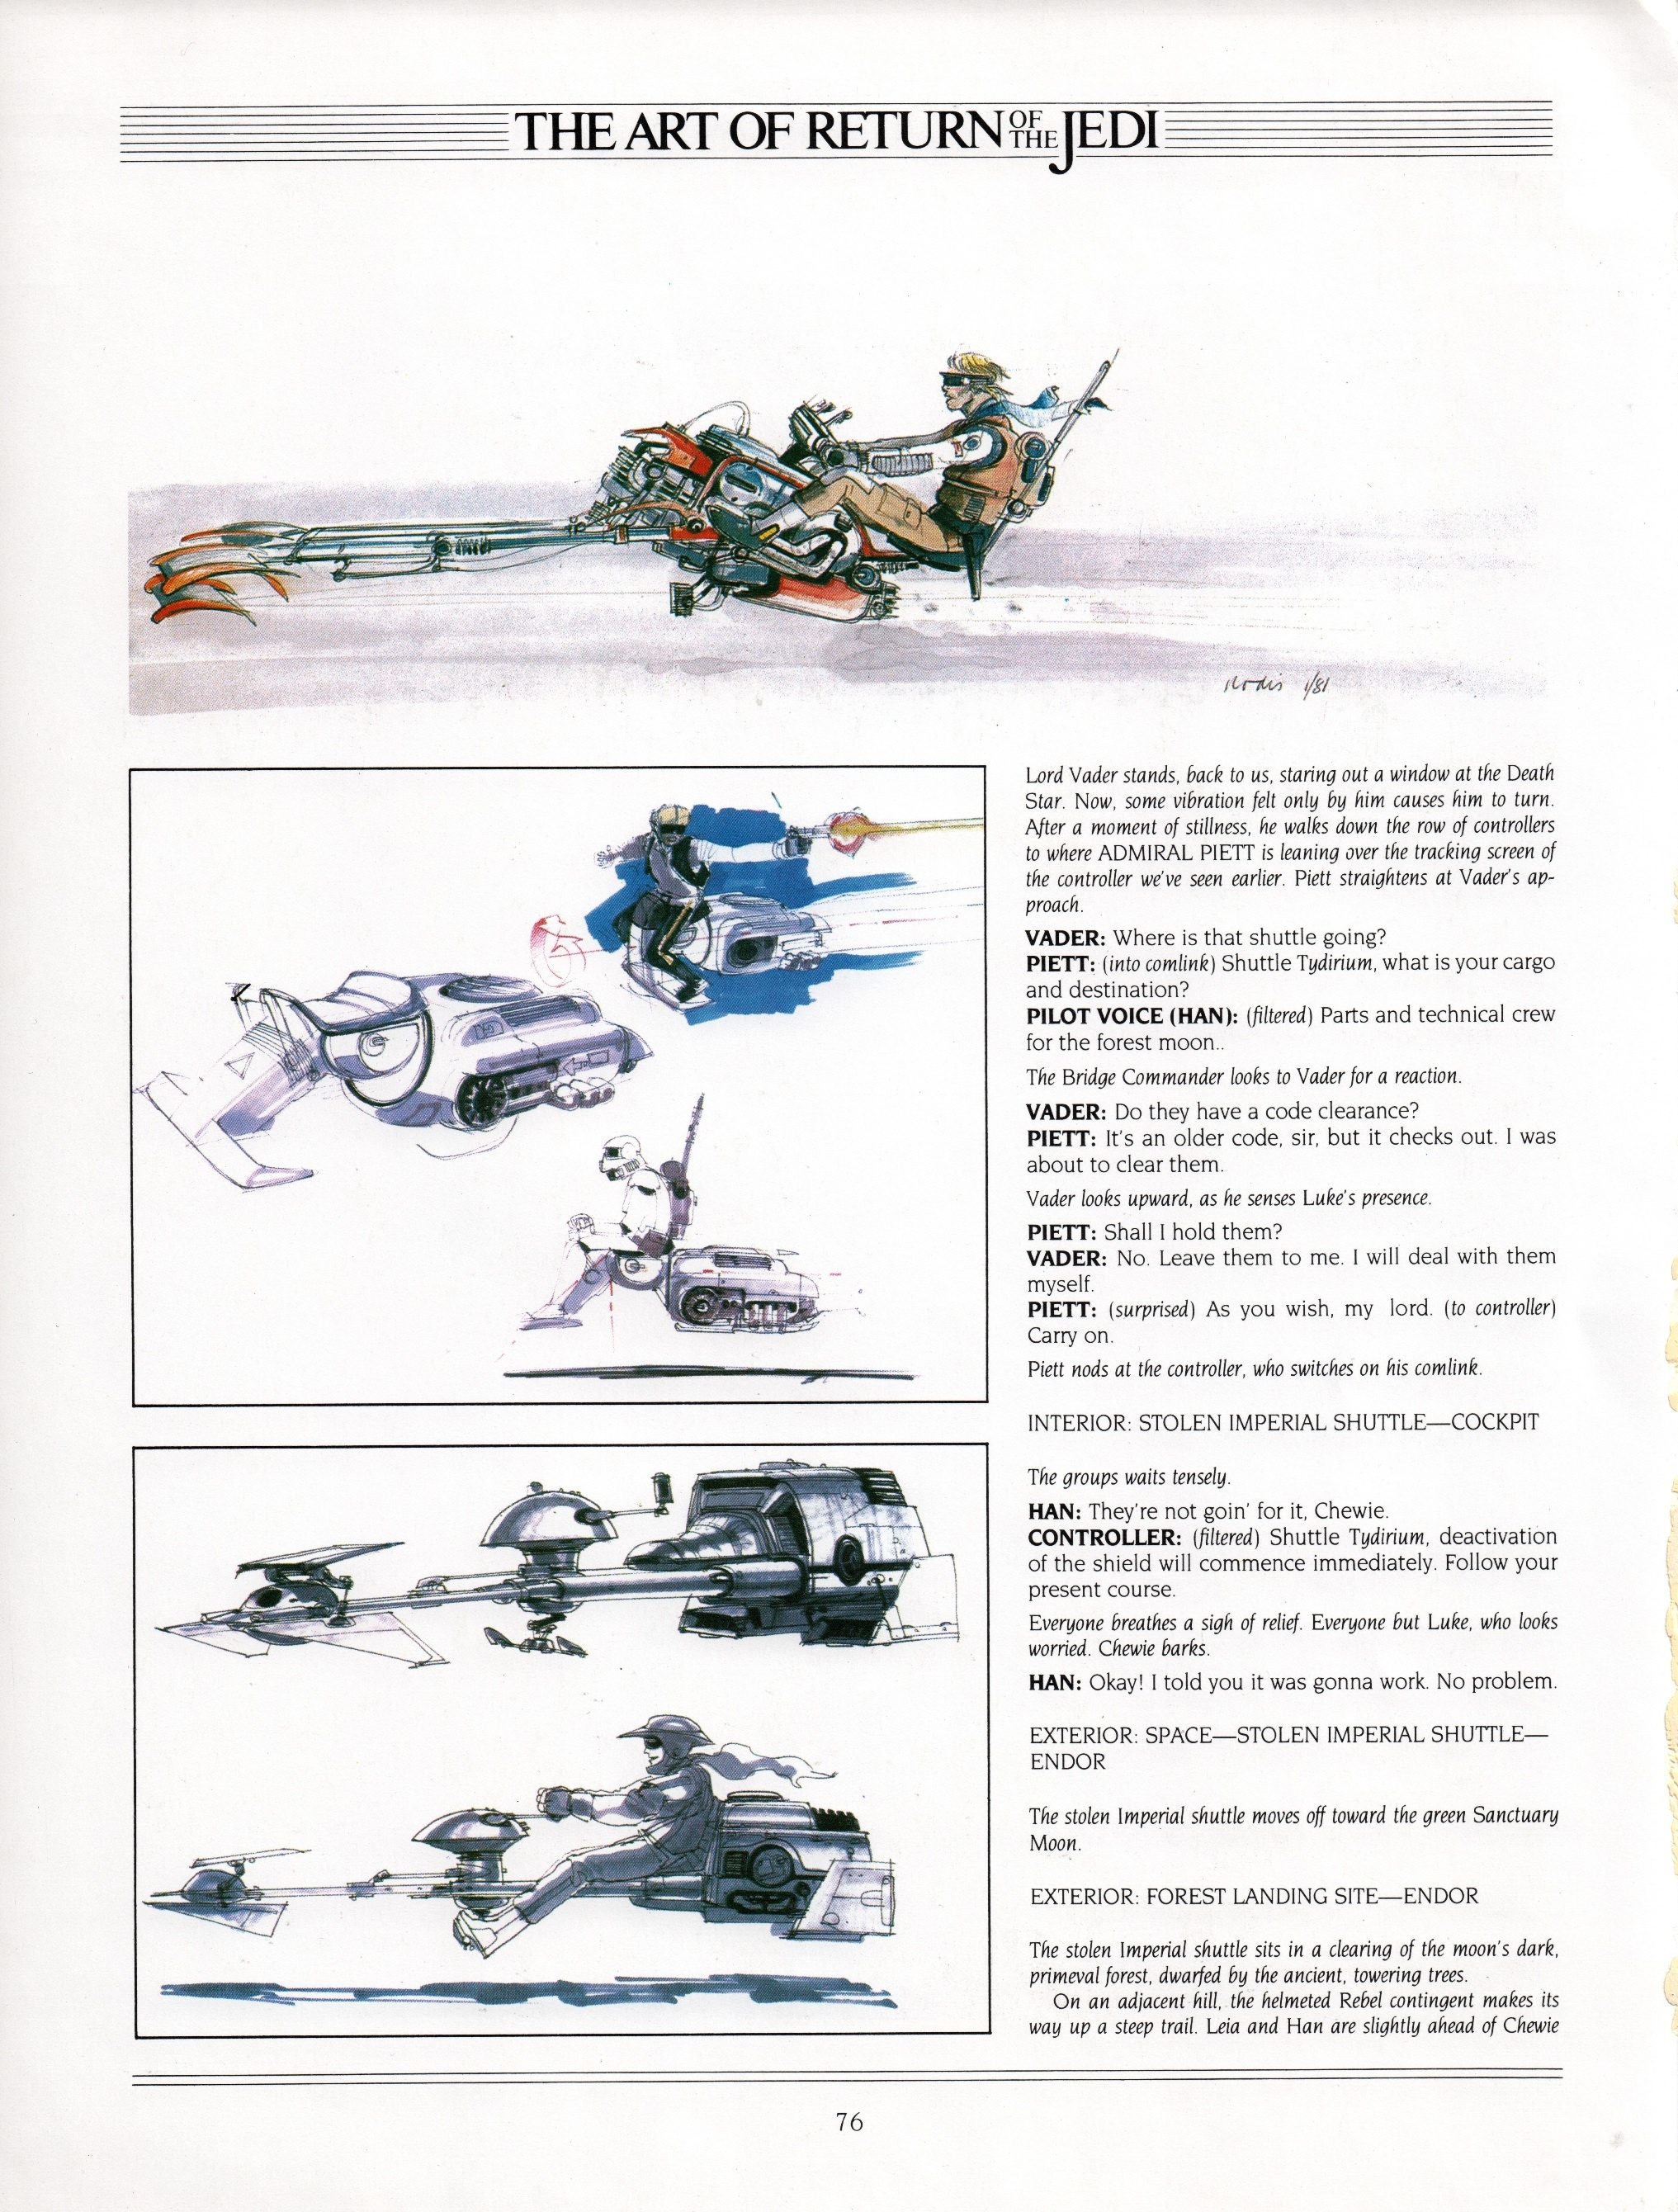 Art of Return of the Jedi (b0bafett_Empire)-p076